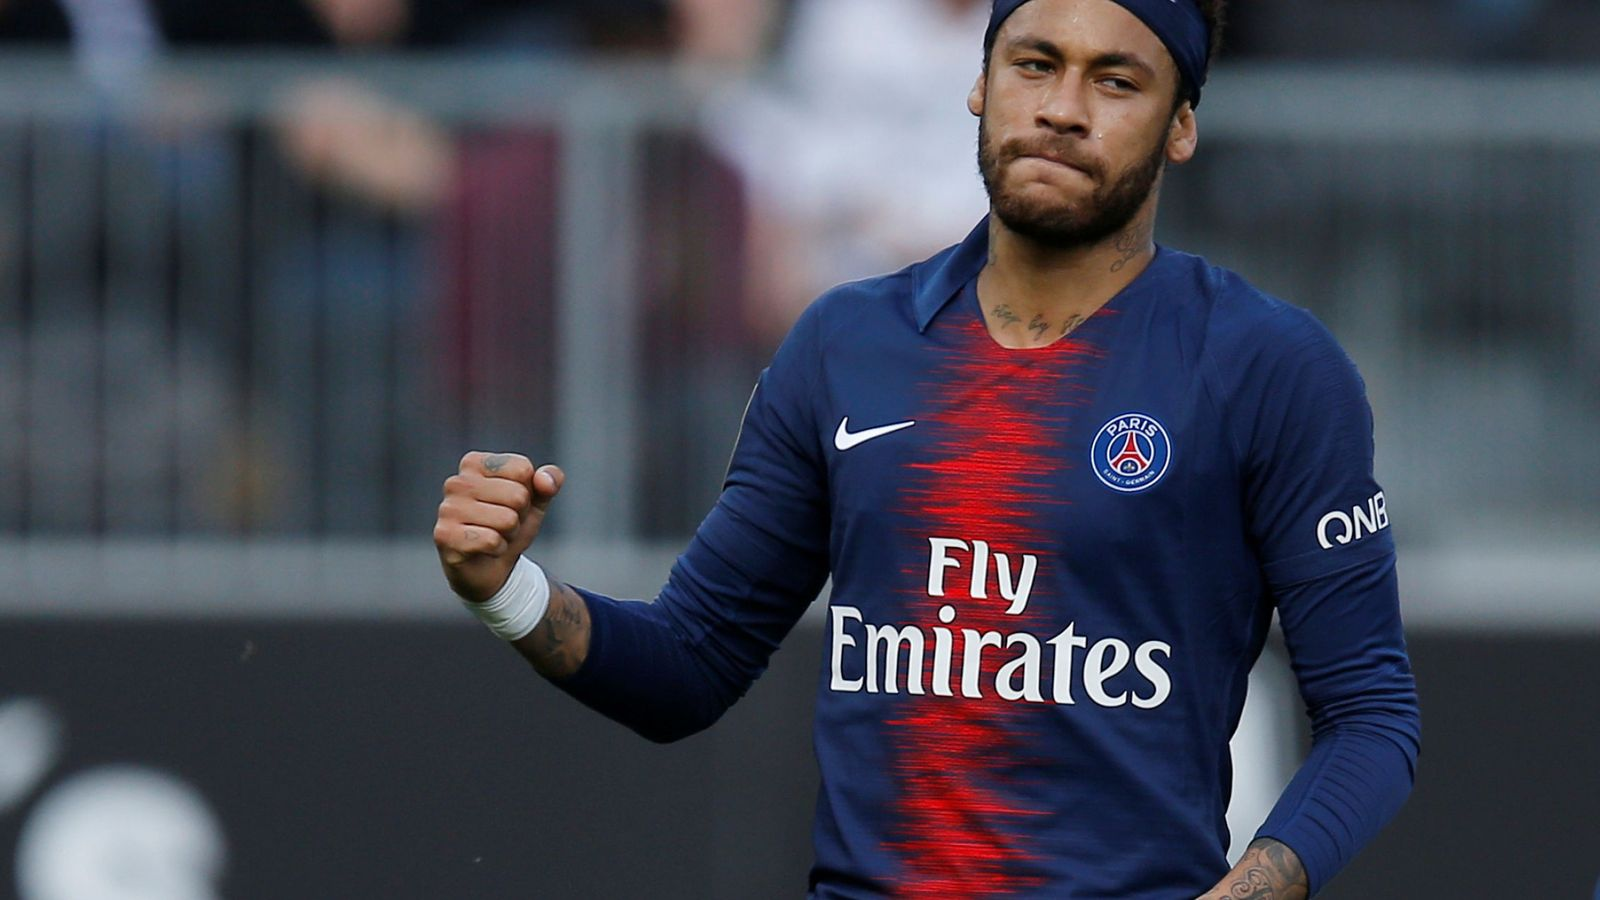 Foto: Neymar con la camiseta del PSG. (Reuters)